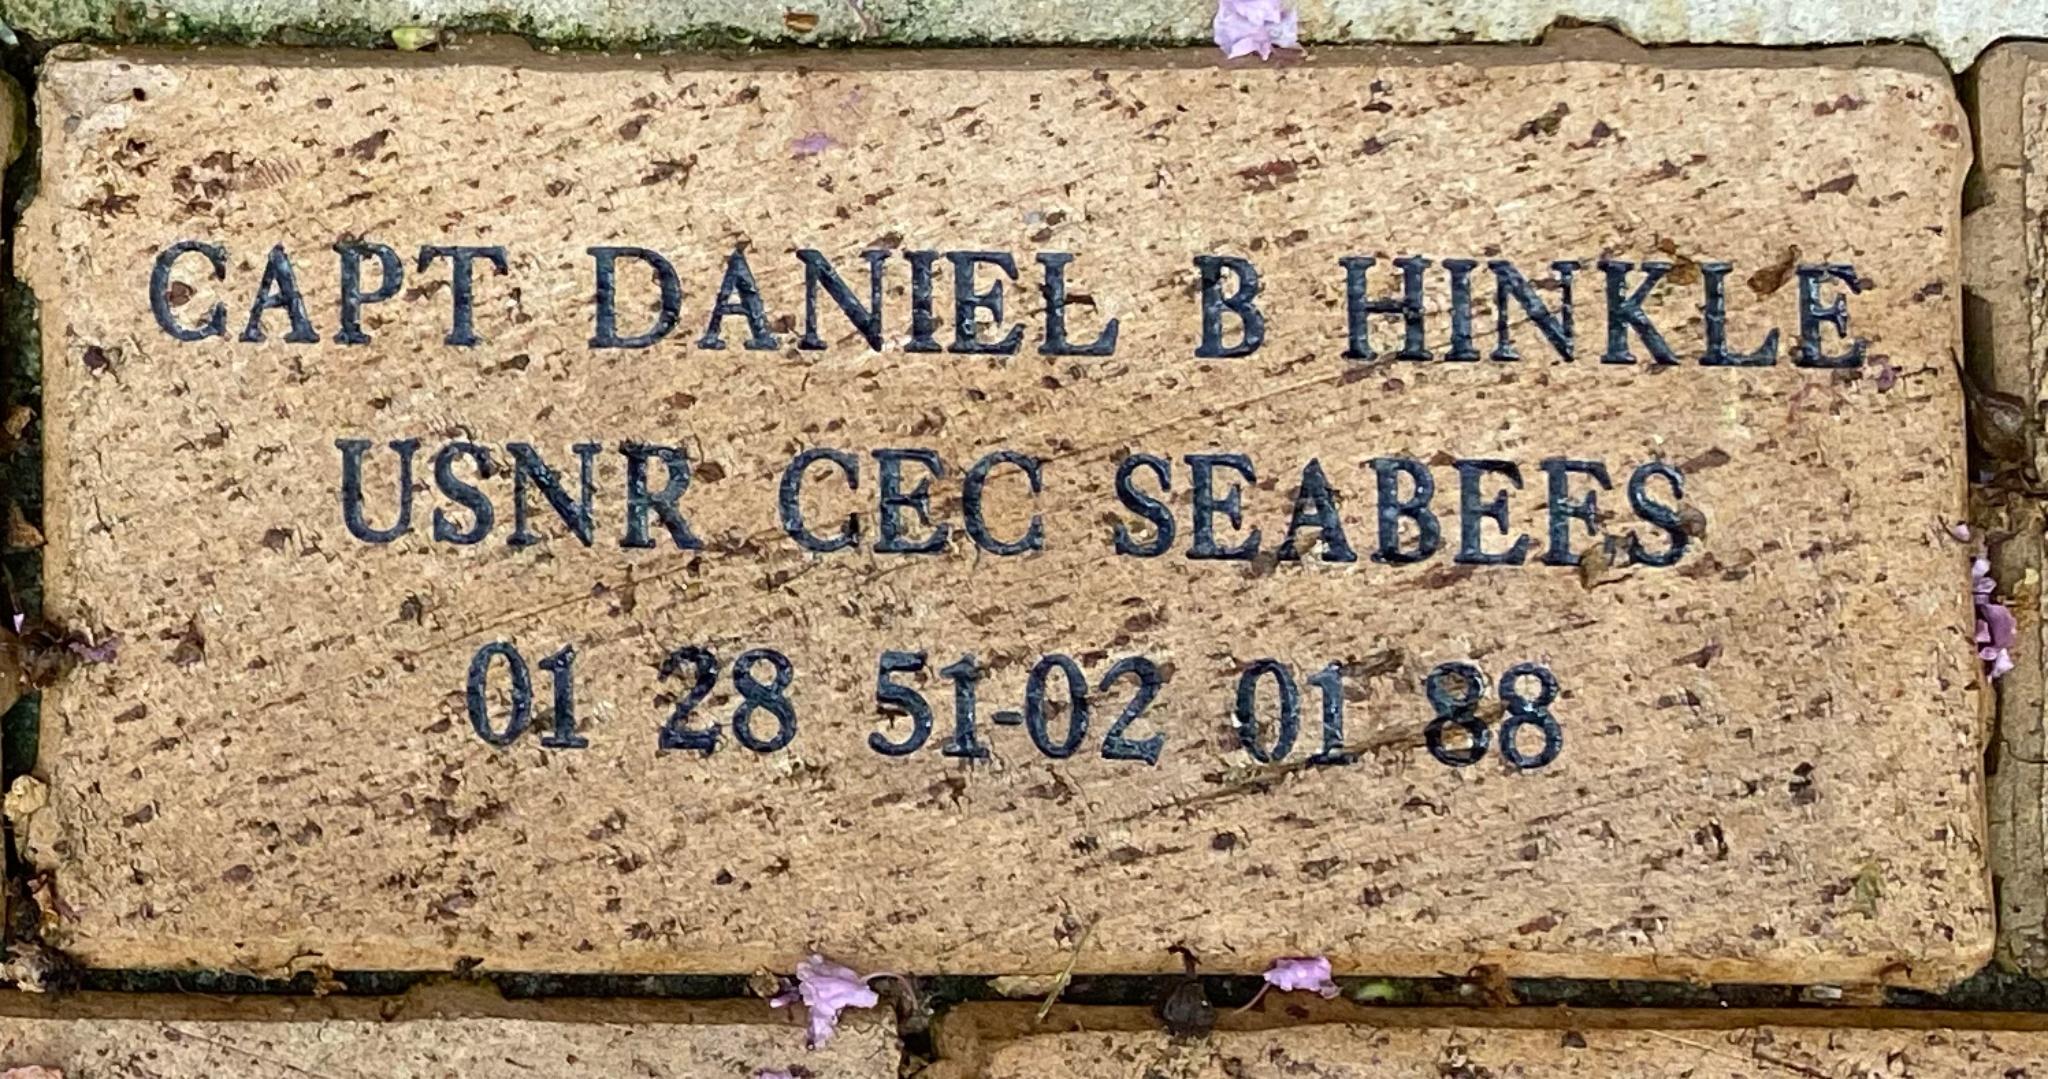 CAPT DANIEL B HINKLE USNR CEC SEABEES 01 28 51-02 01 88